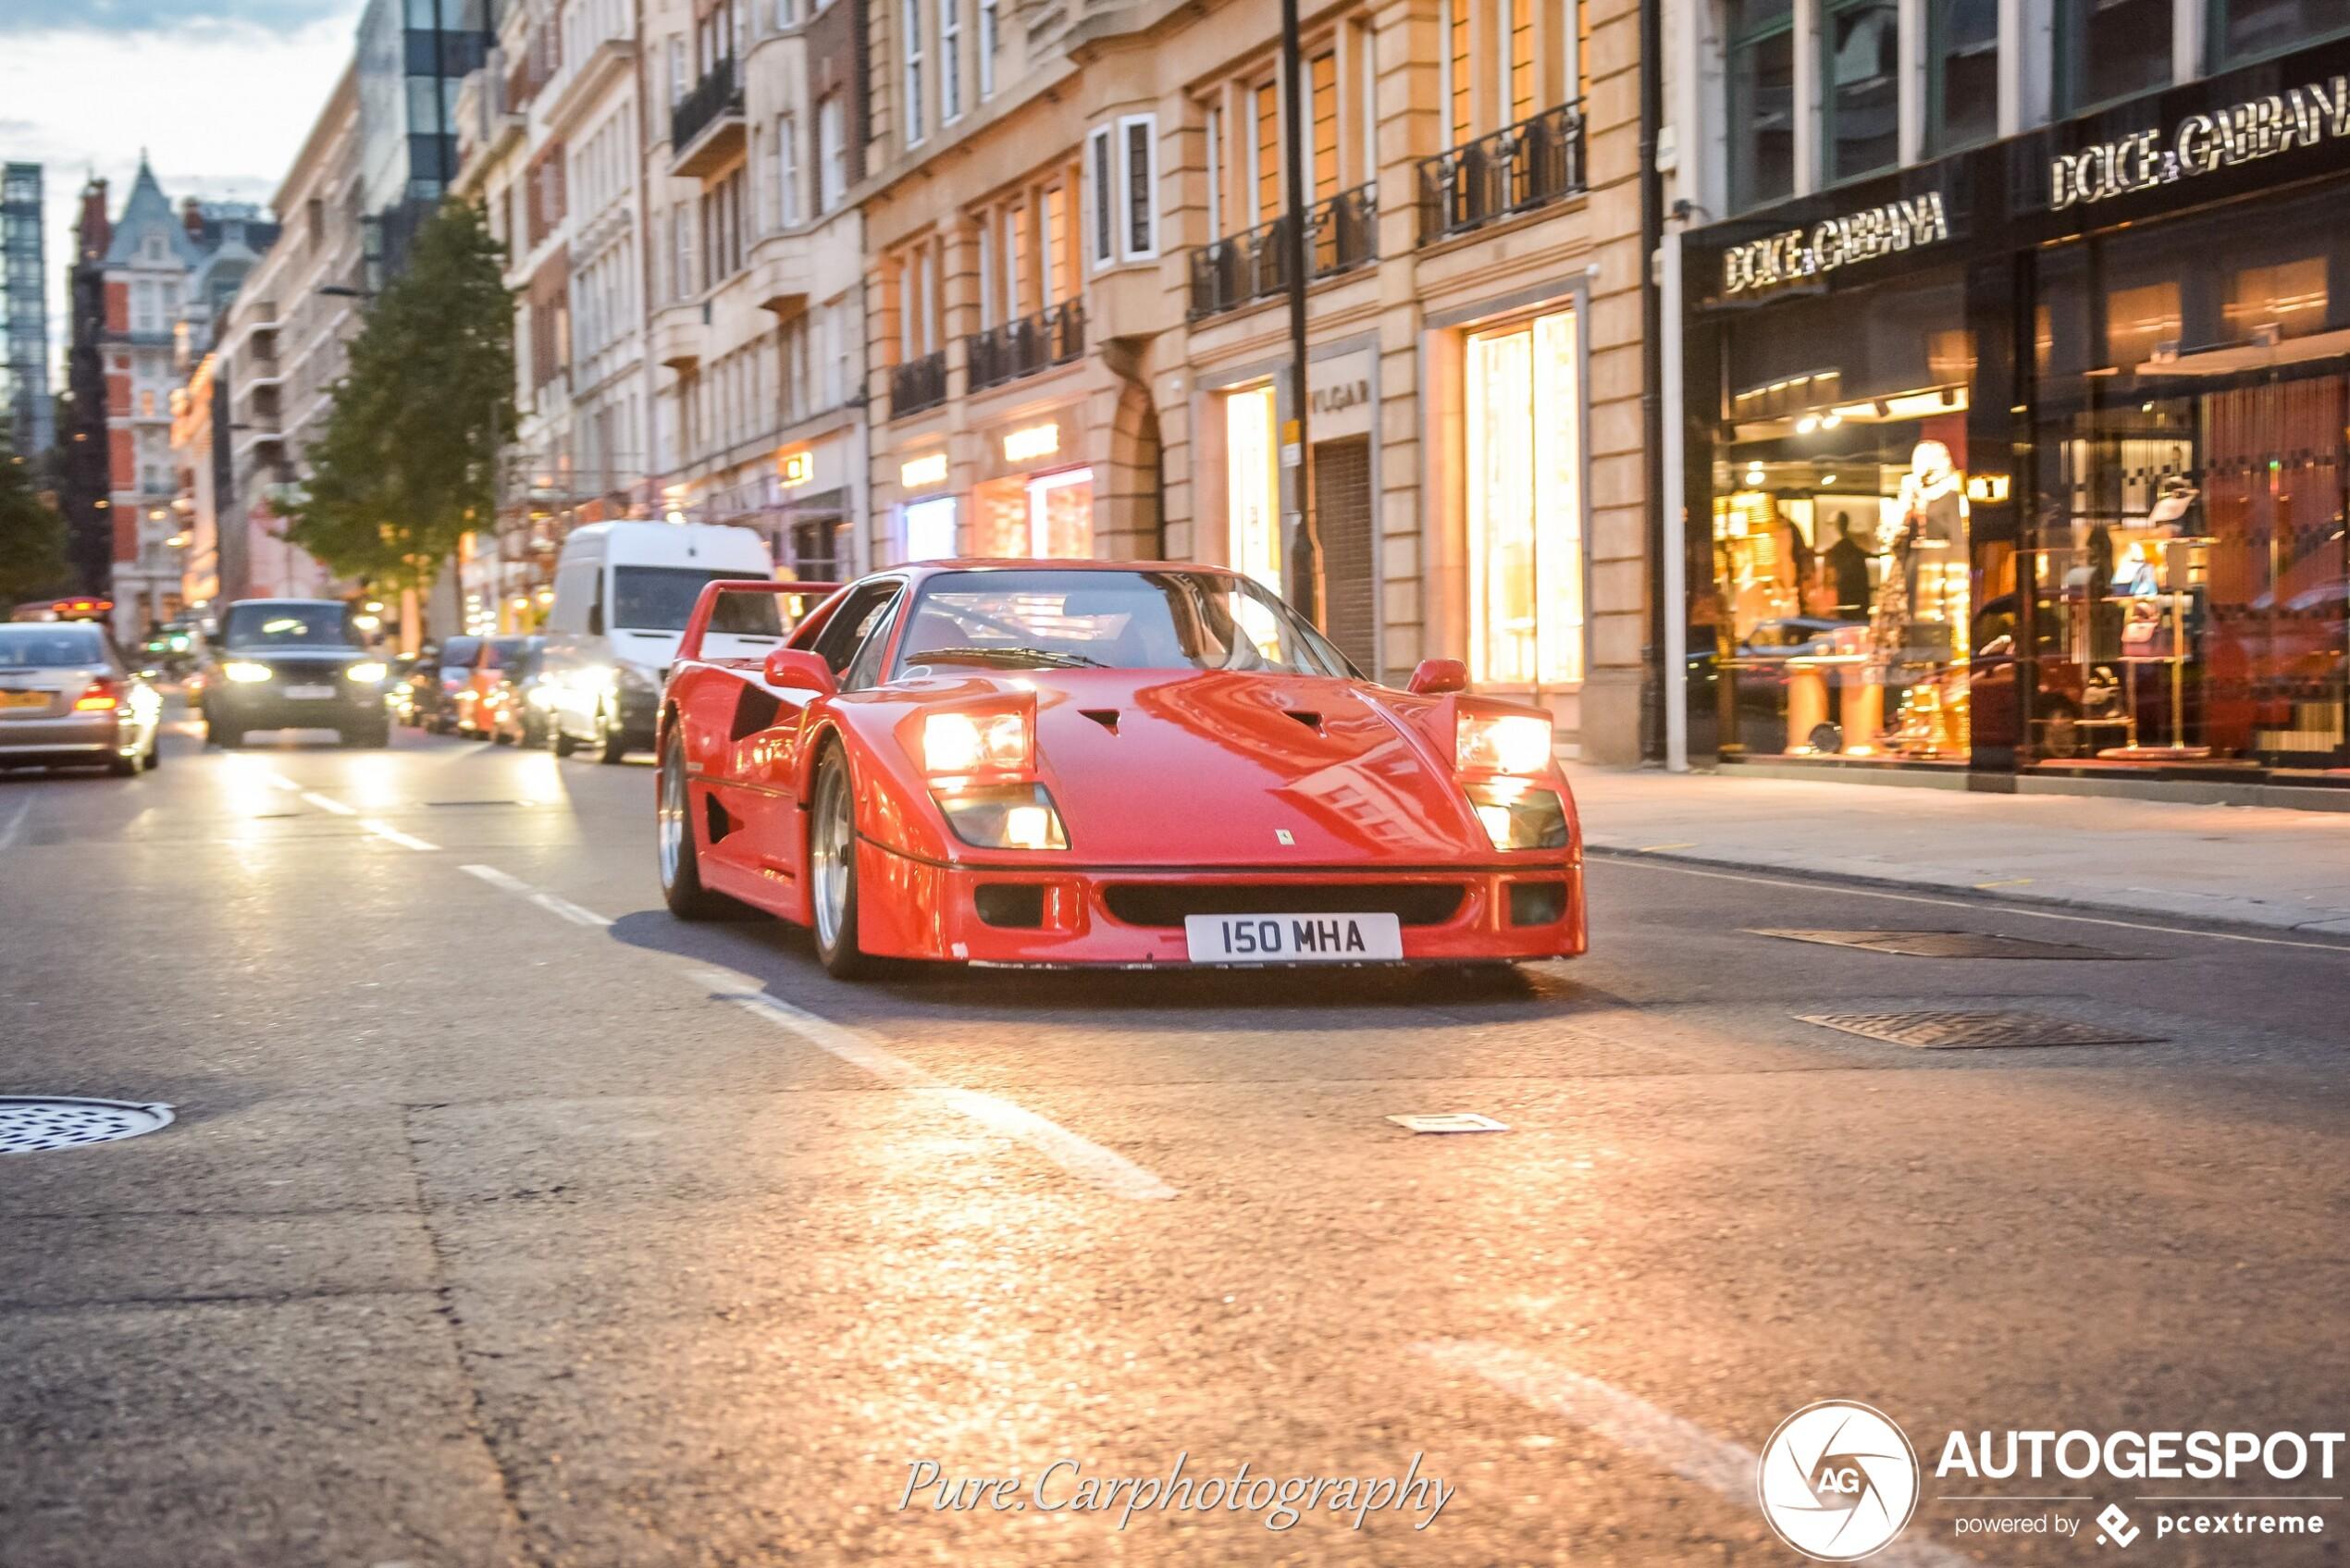 Ferrari F40 maakt Sloane Street onveilig